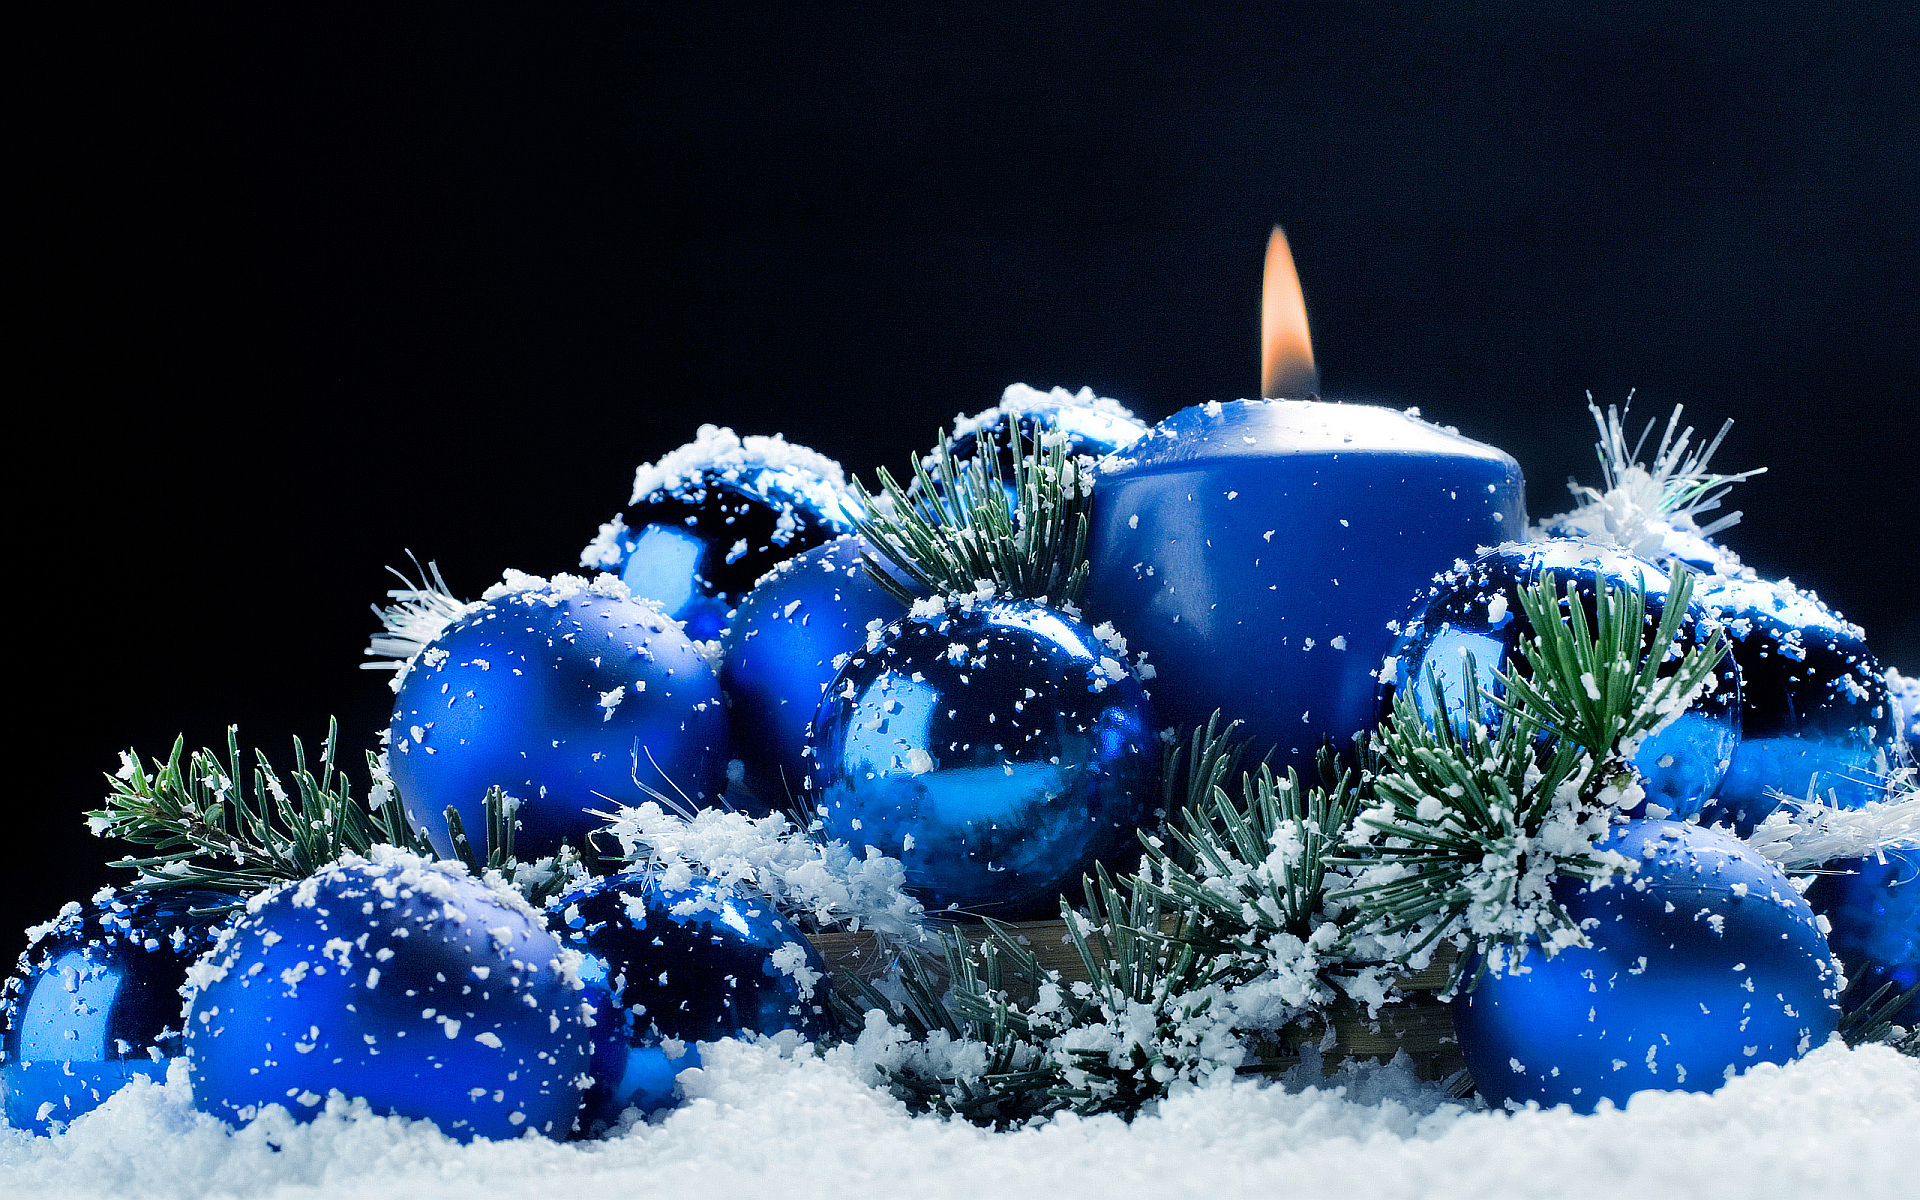 candle141127-03